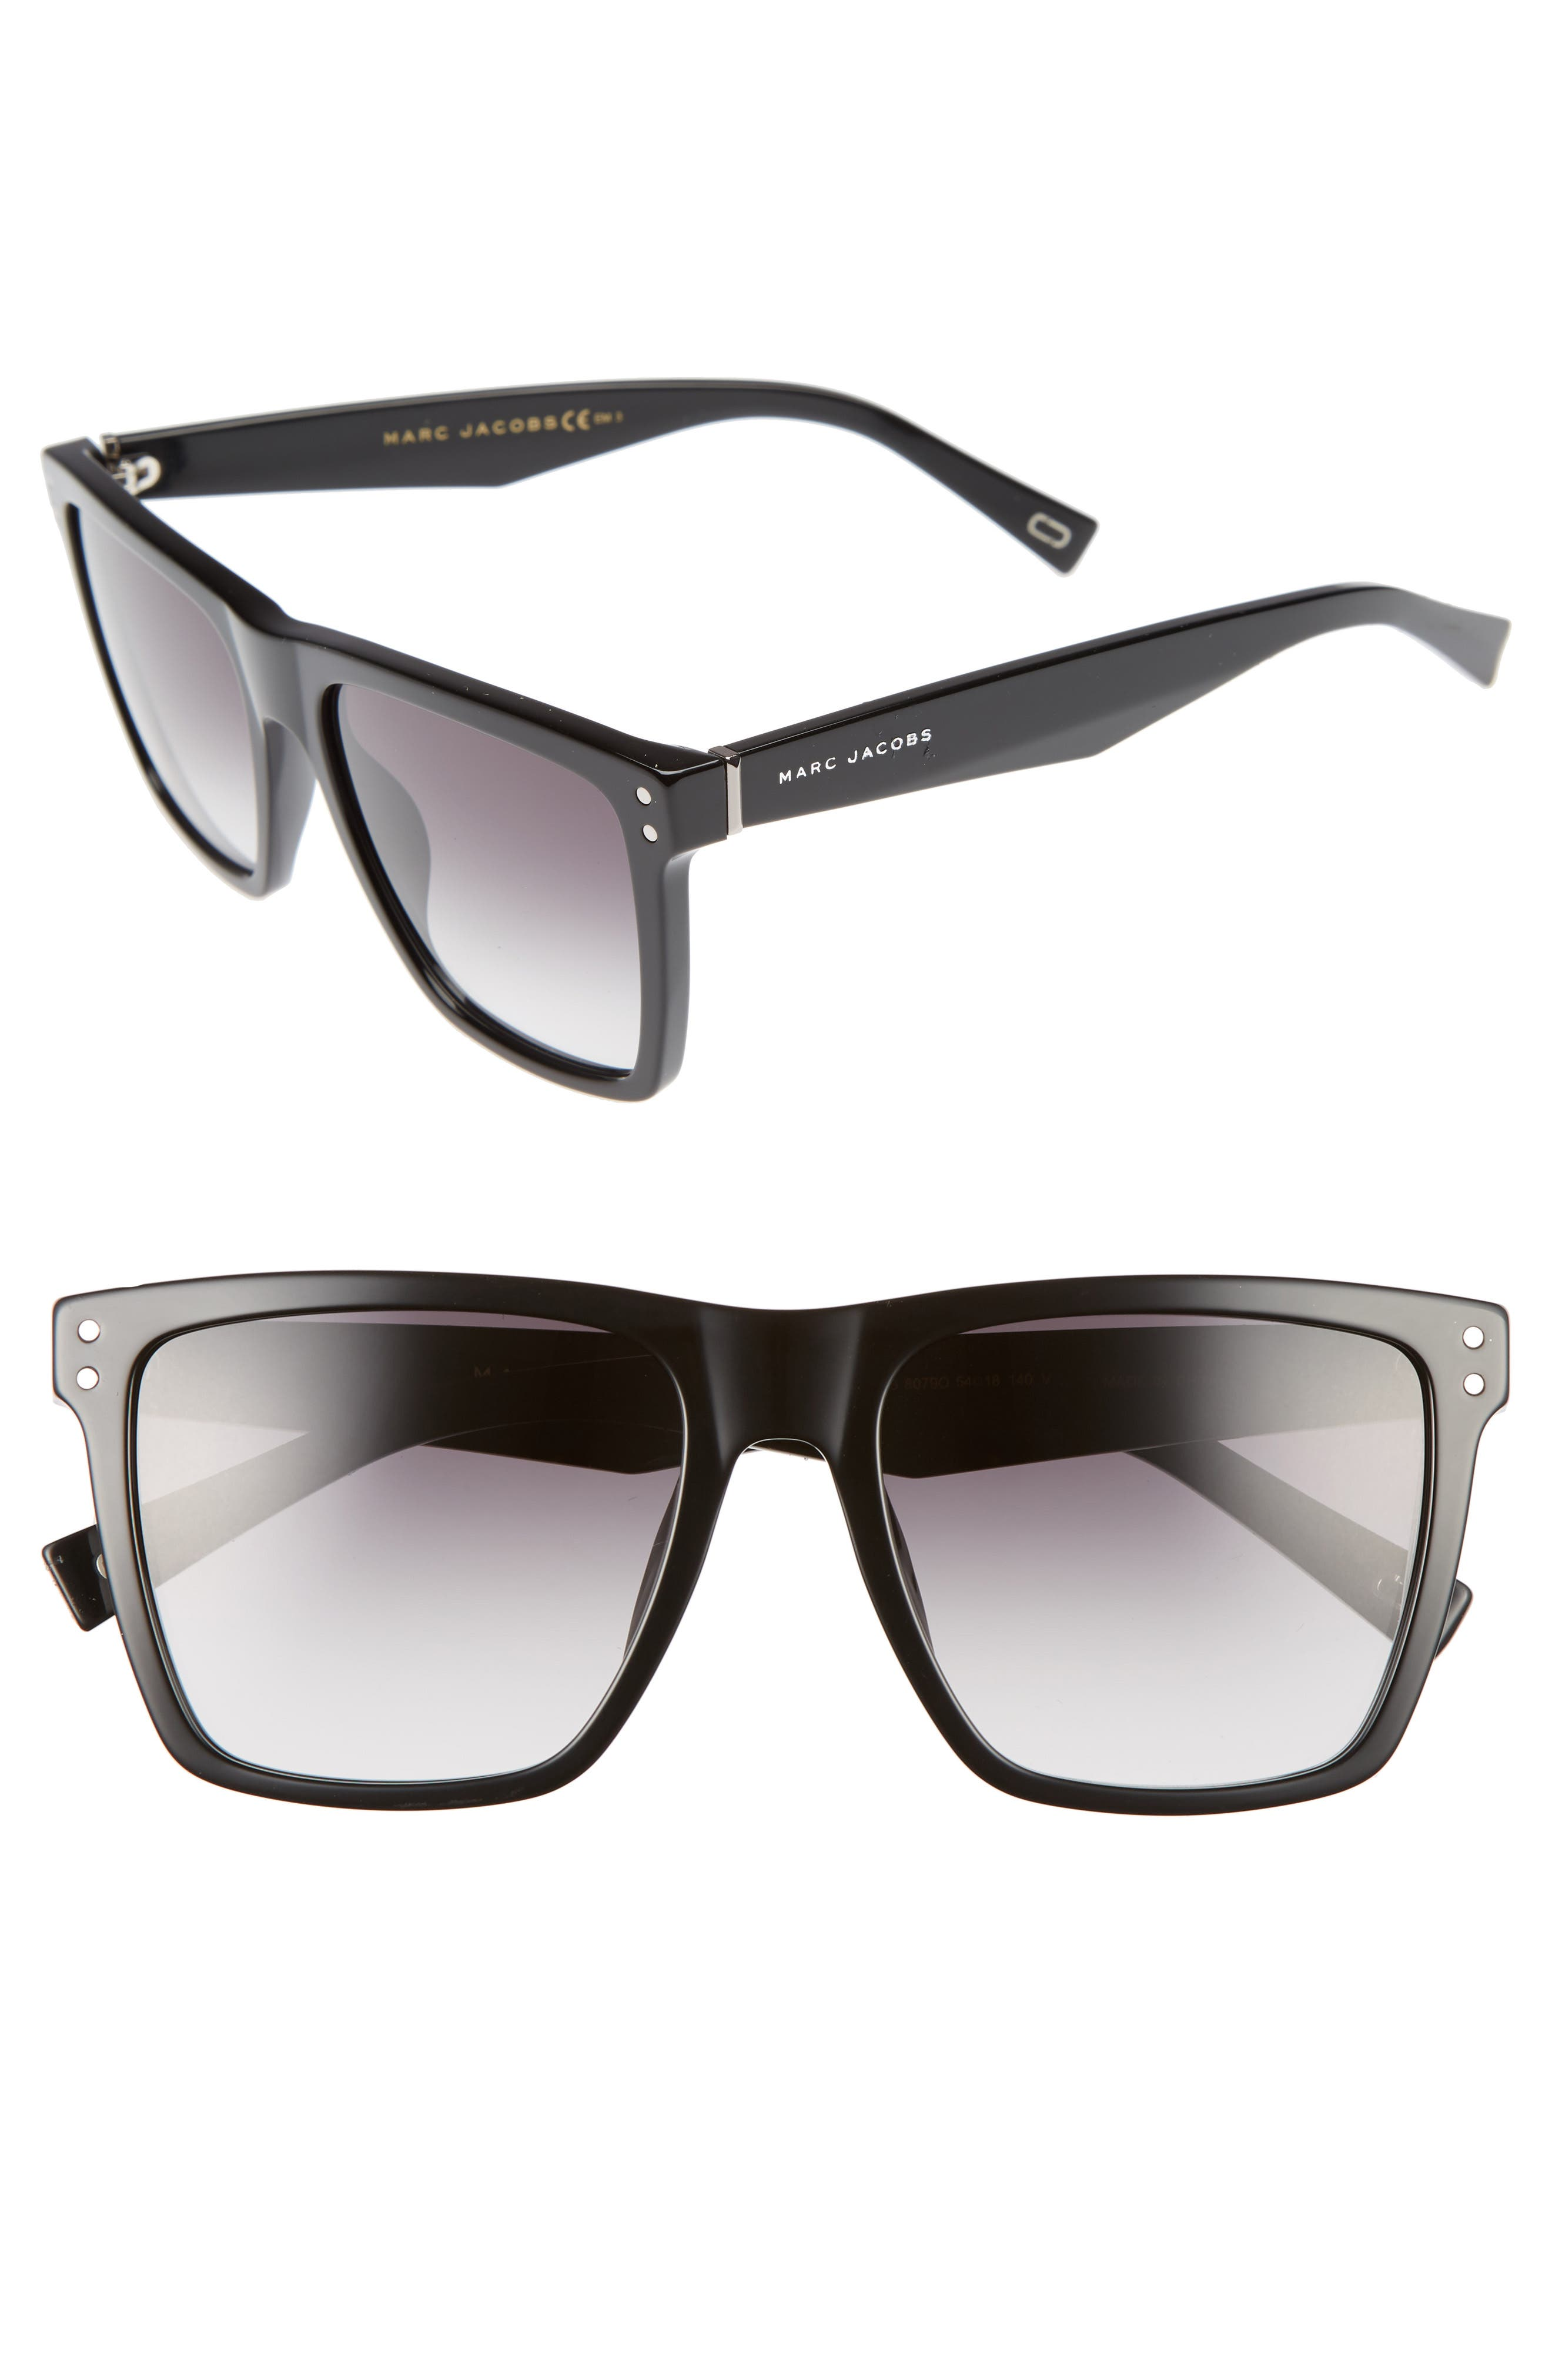 54mm Flat Top Gradient Square Frame Sunglasses,                             Main thumbnail 1, color,                             001